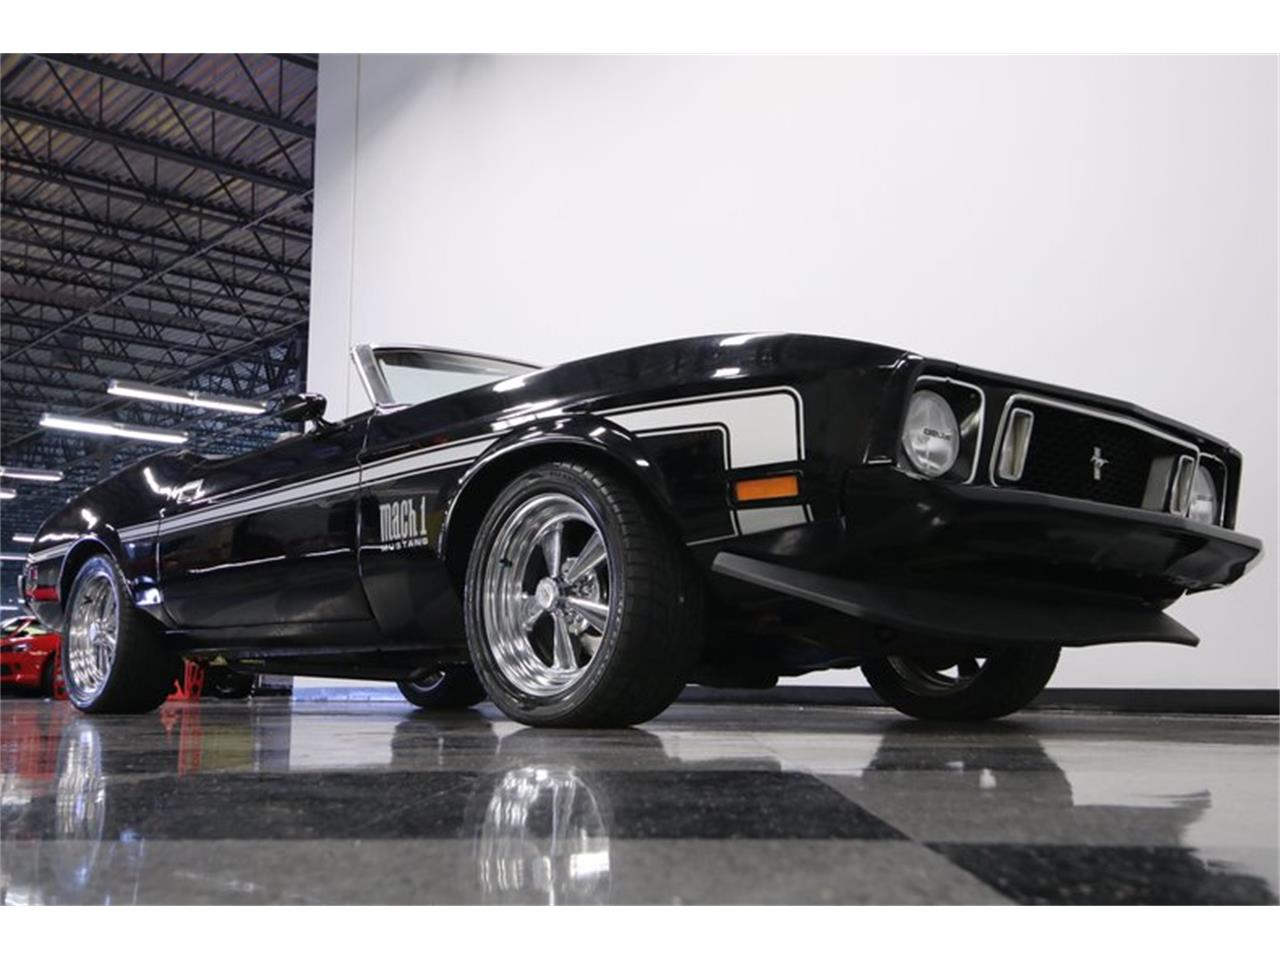 Ford Mustang Mac 1 1973 prix tout compris